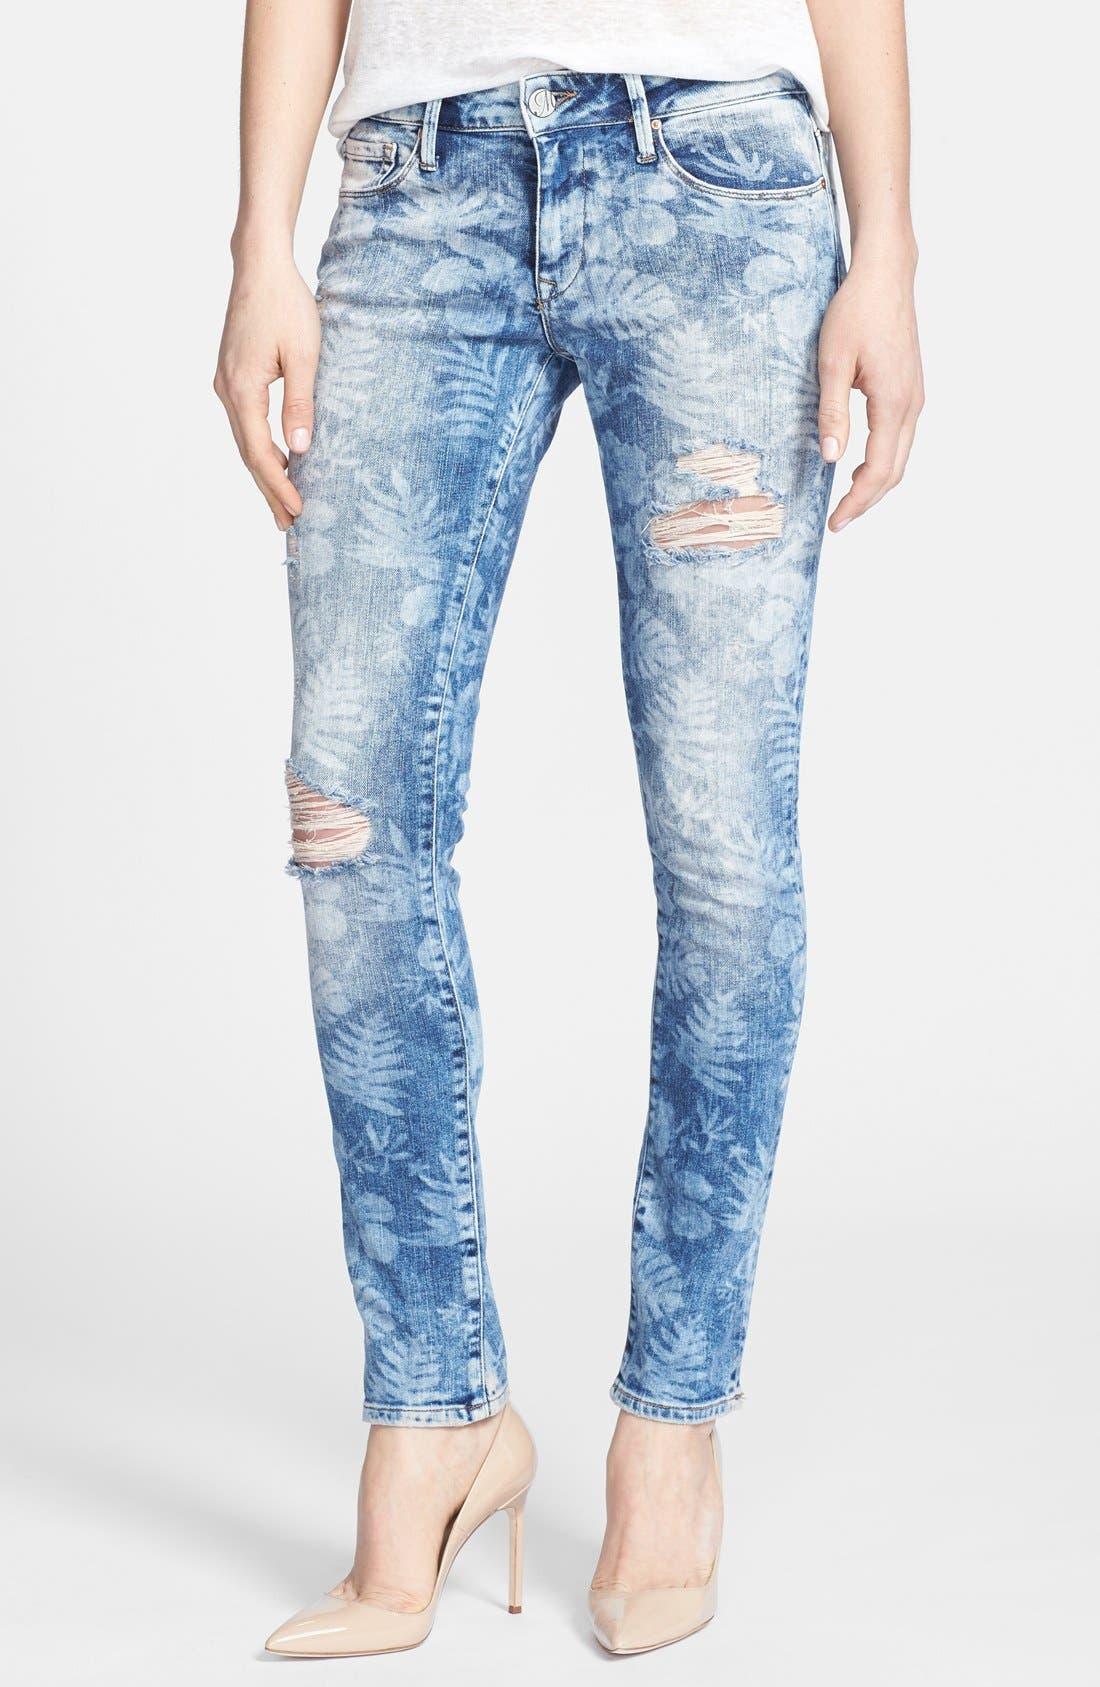 Main Image - Mavi Jeans 'Alexa Vintage' Distressed Stretch Skinny Jeans (Artist Vintage)